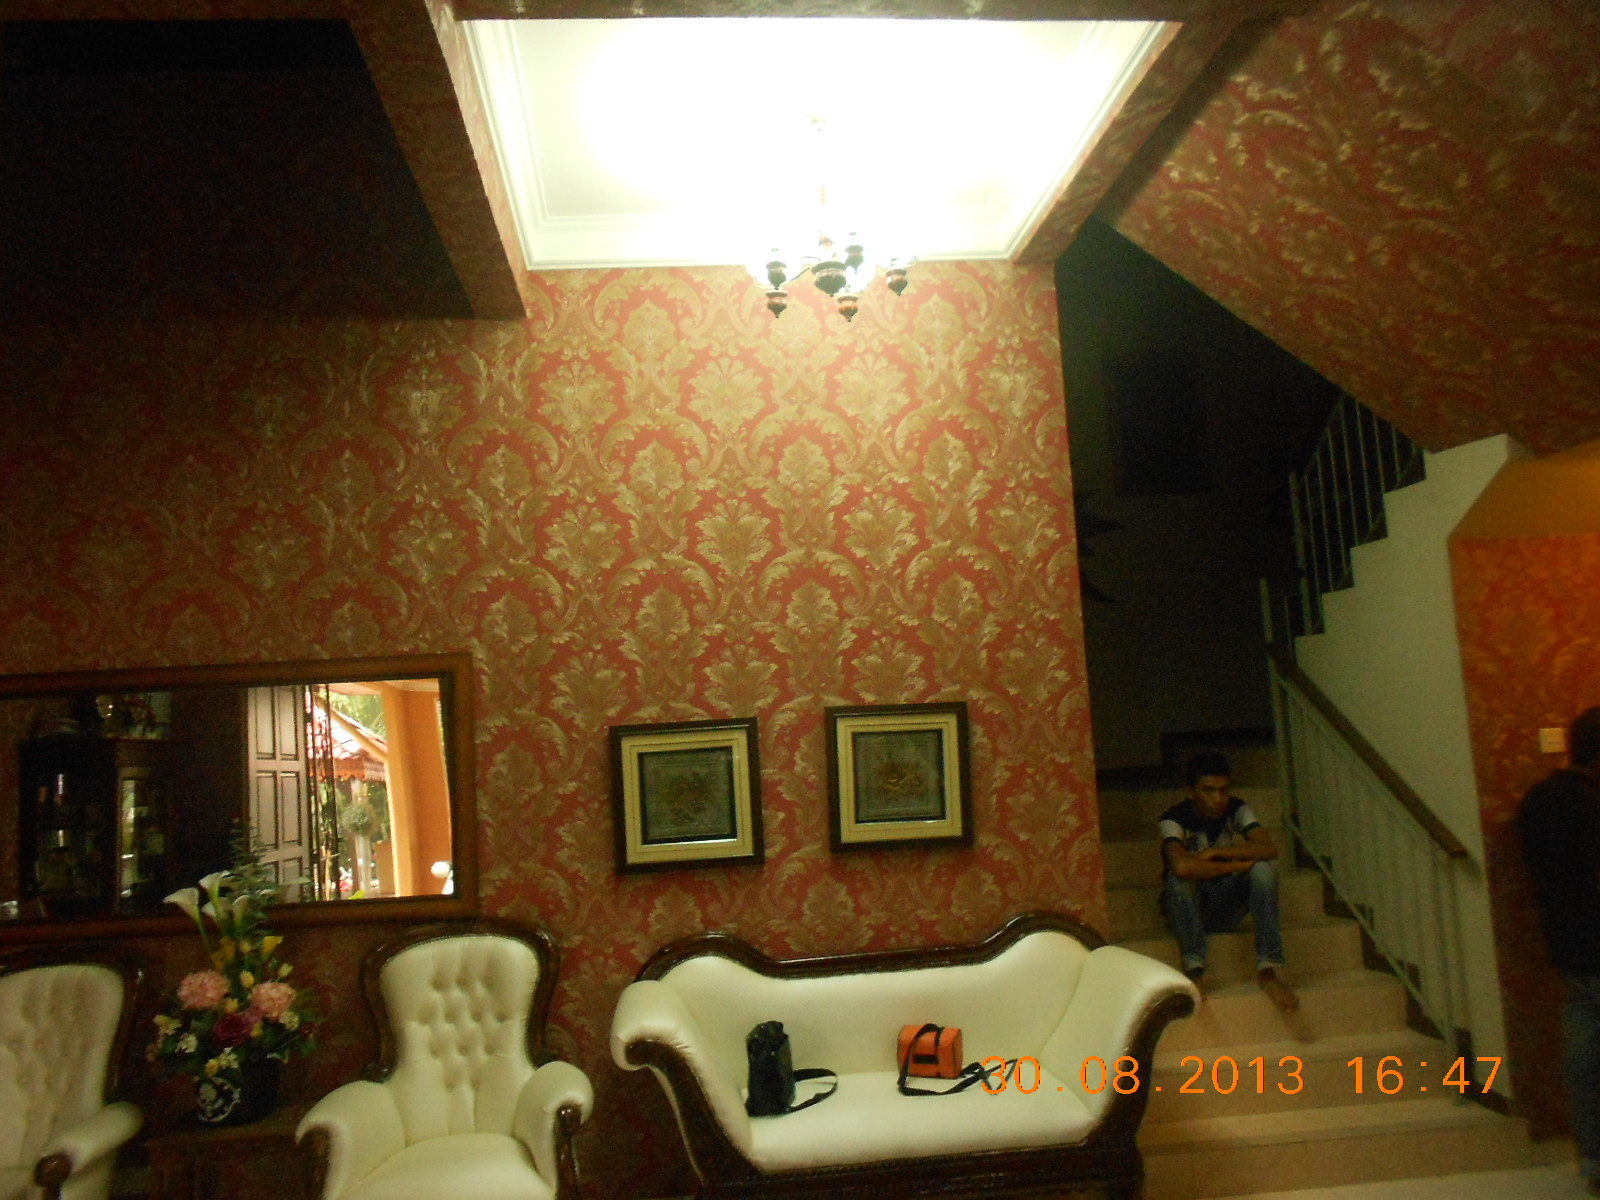 Repair Sofa Shah Alam Most Compact Sleeper Rumah 3 Tingkat Dengan Wallpaper Mewah Baiti Jannati Deco